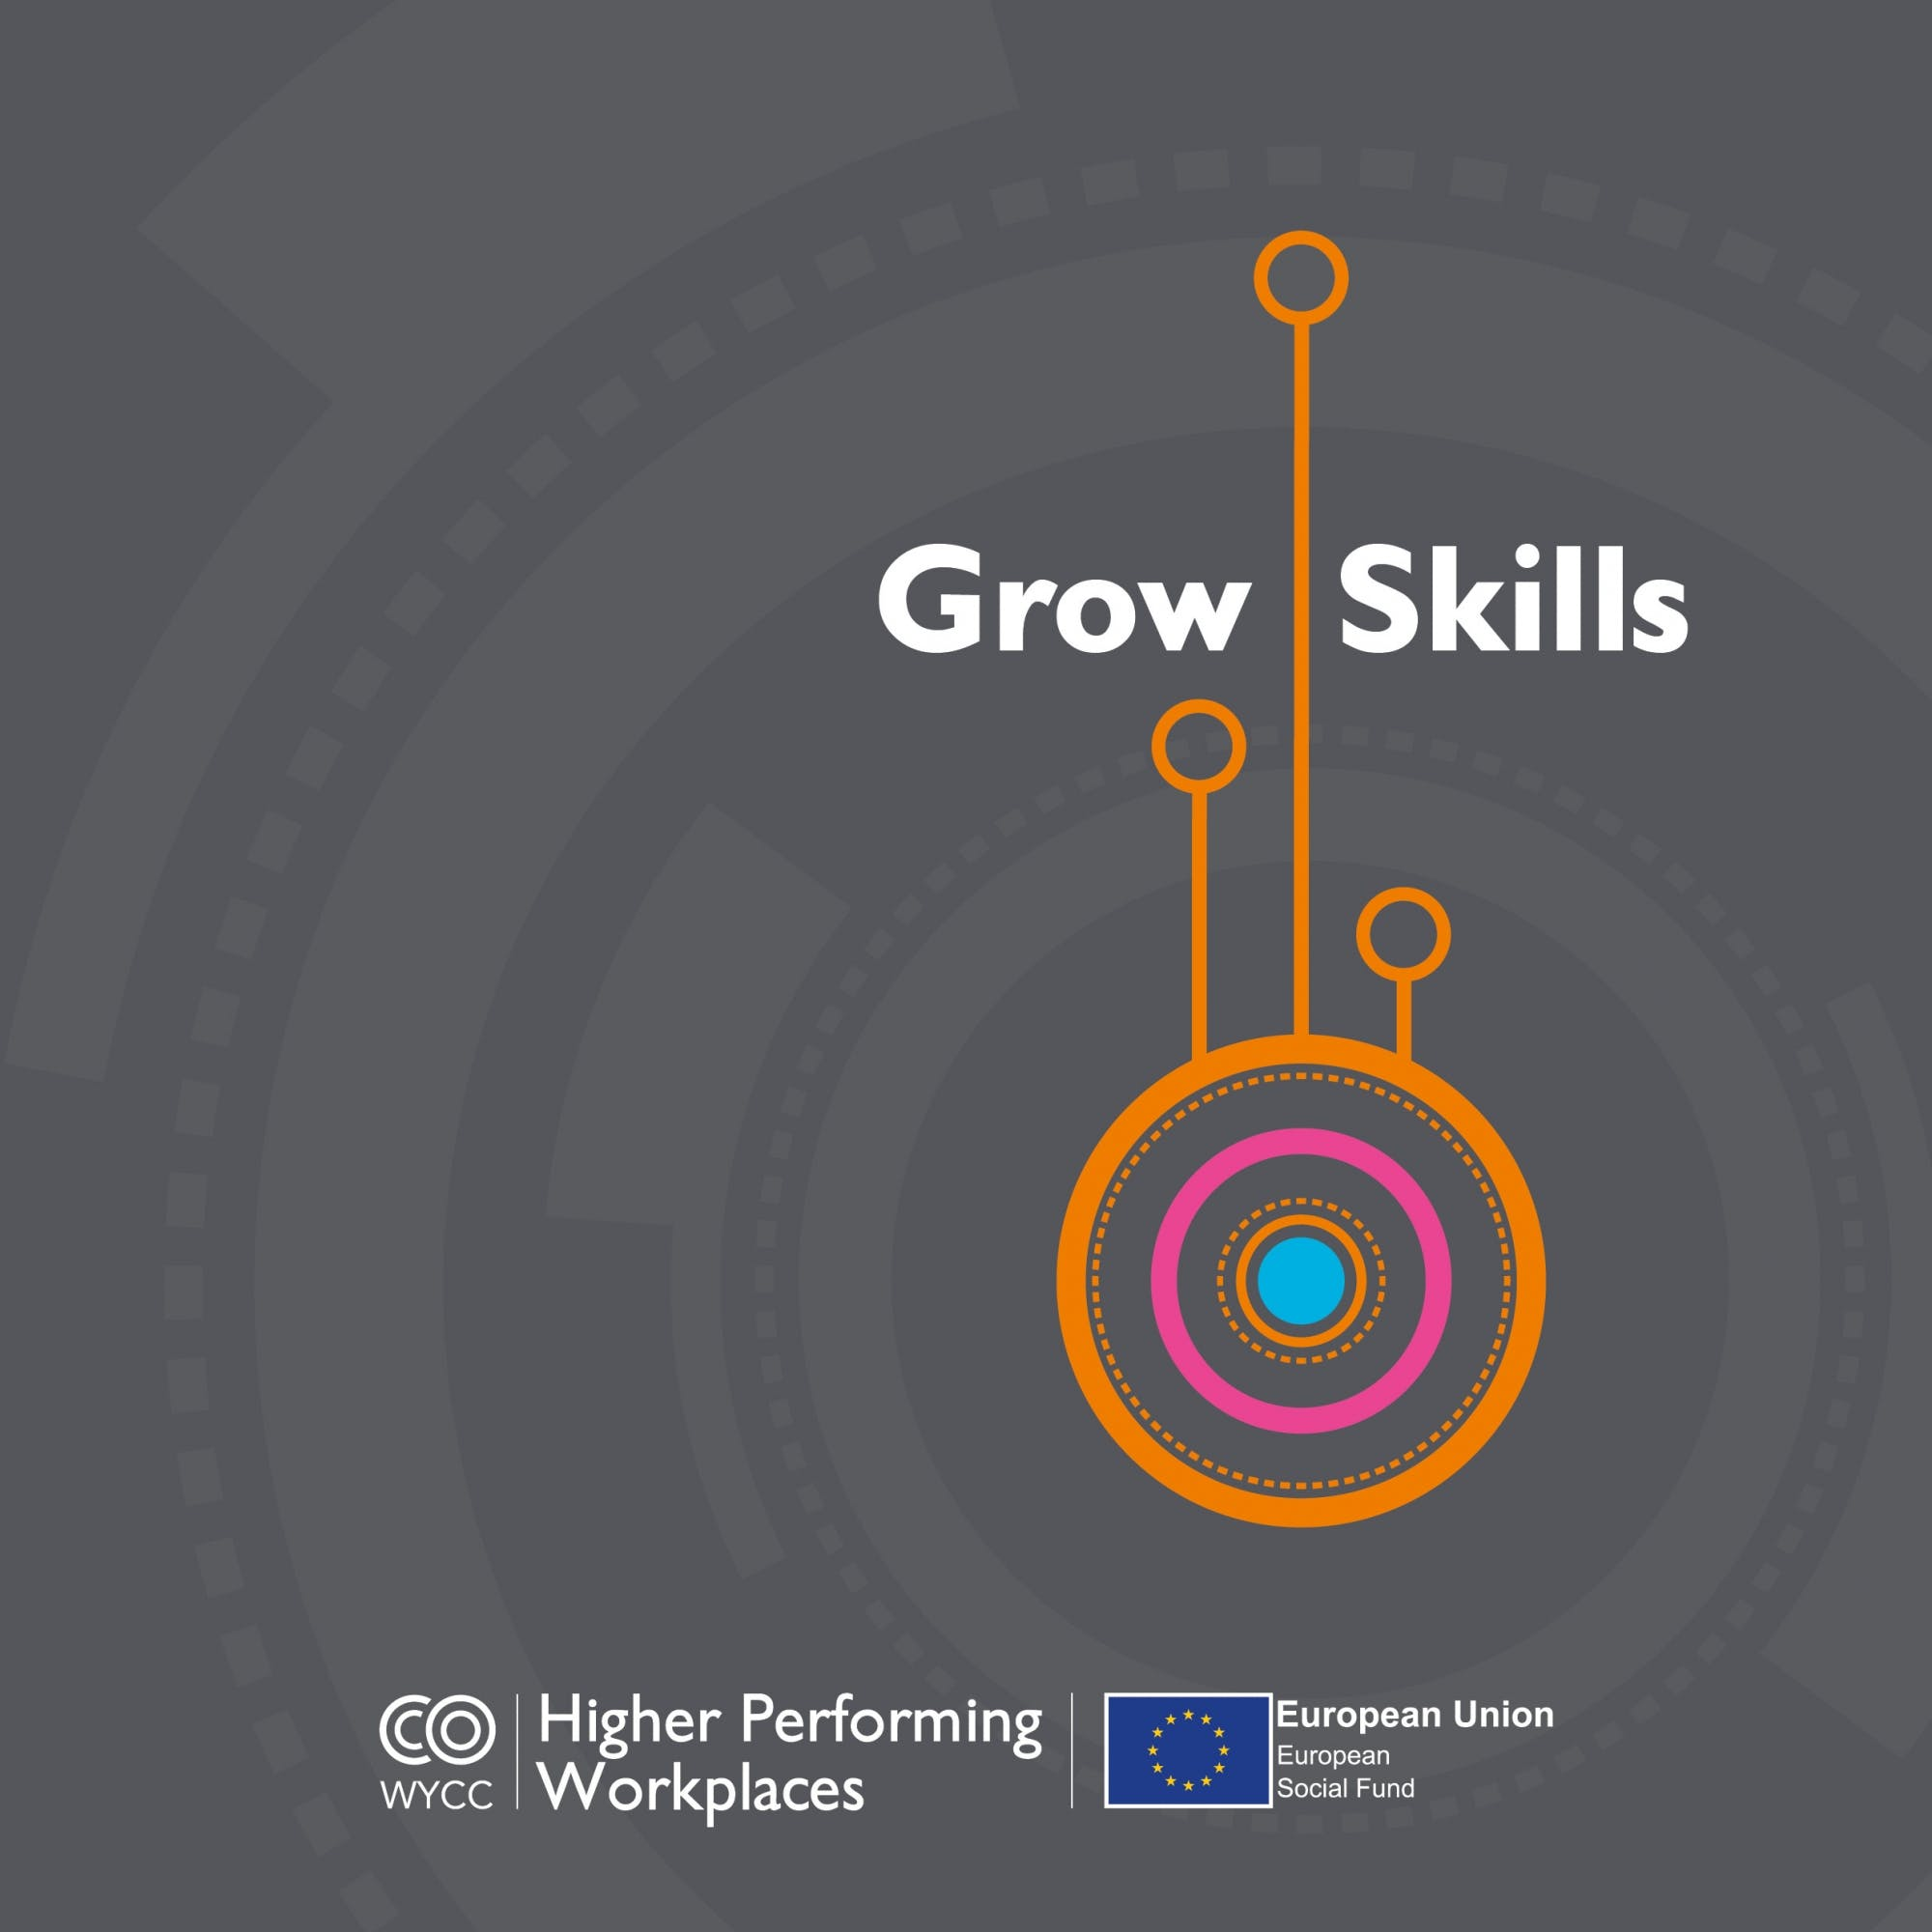 Grow Skills HPW brochure